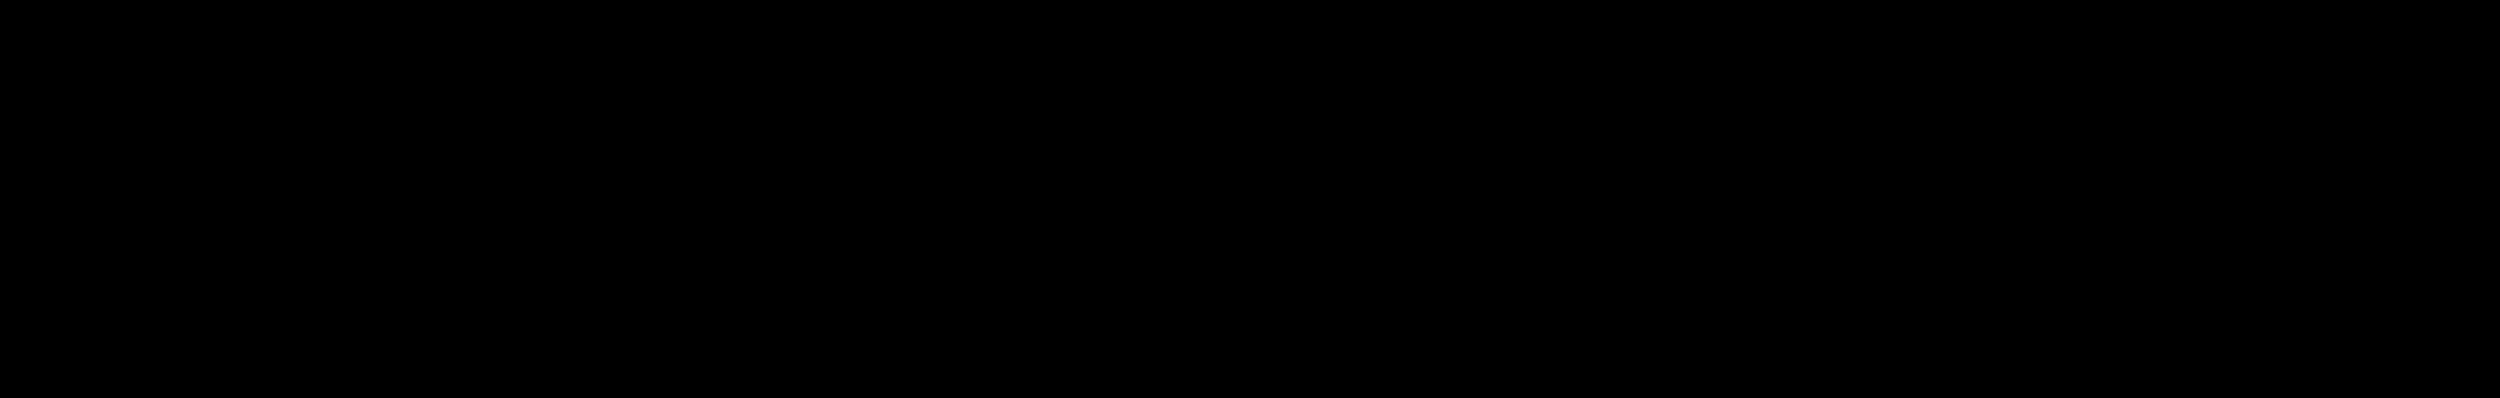 RODOLGO AGRELLA-logofull-01.png